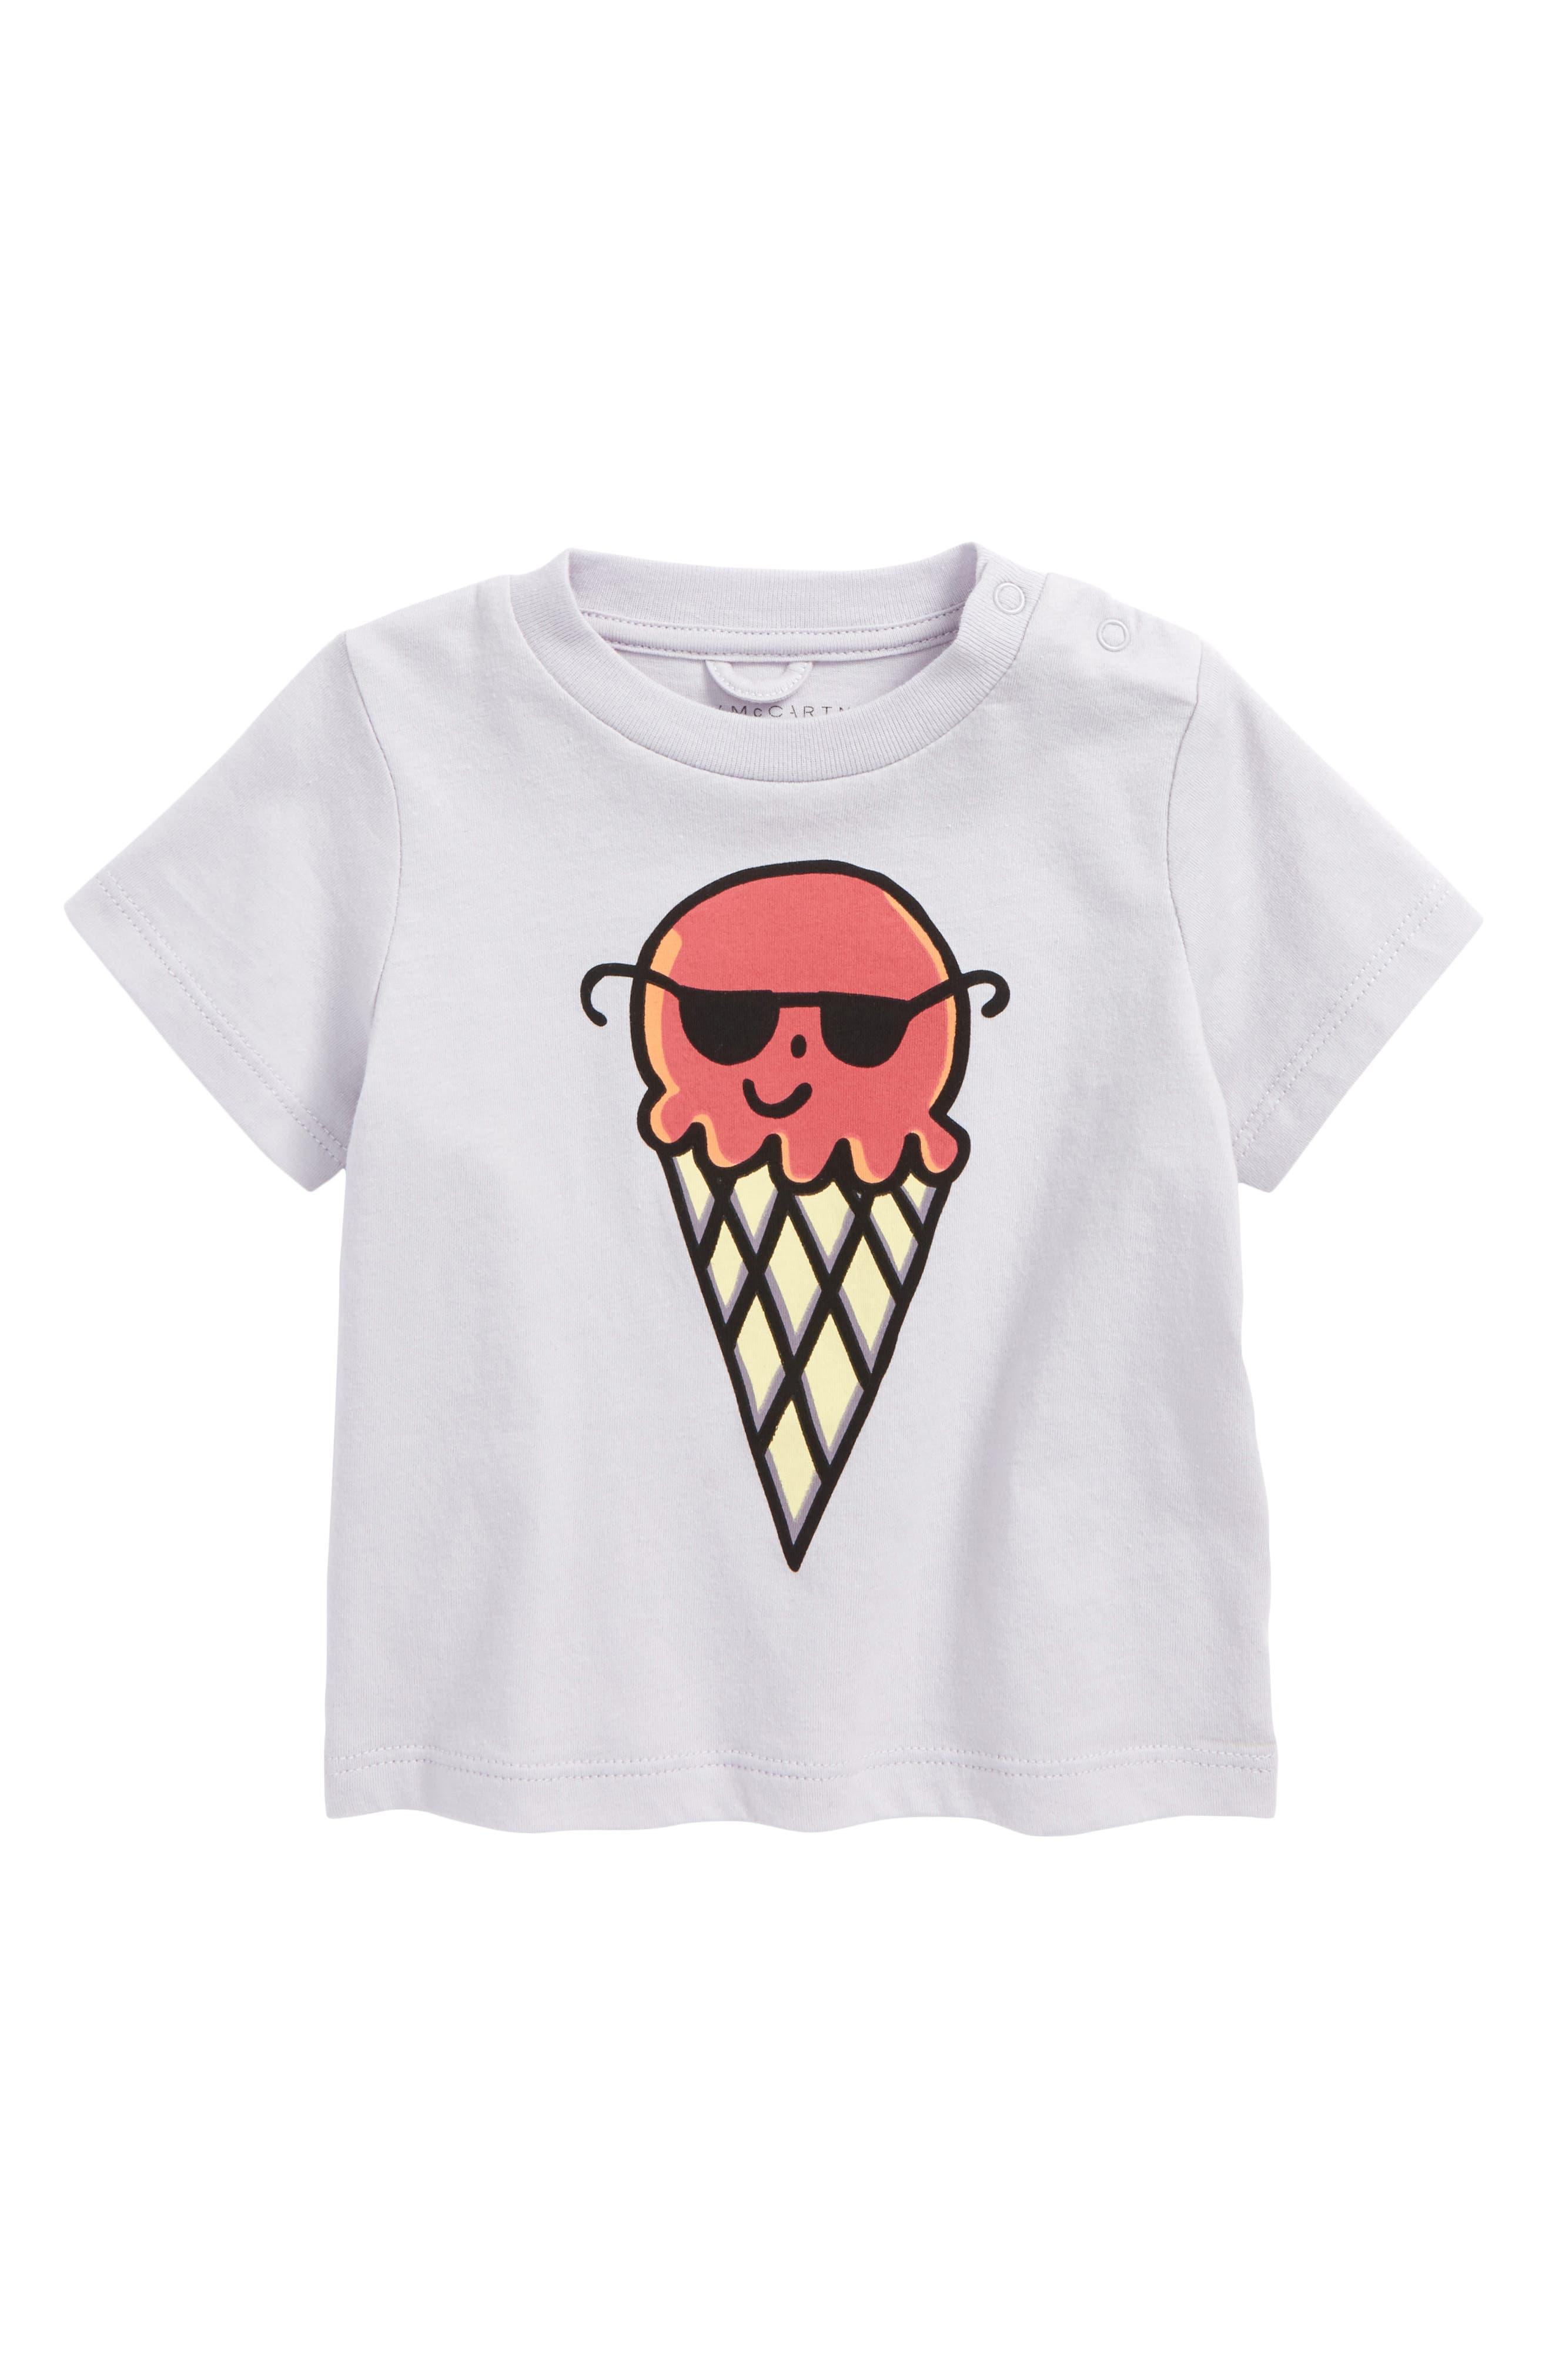 Chuckle Ice Cream Cone Tee,                         Main,                         color,